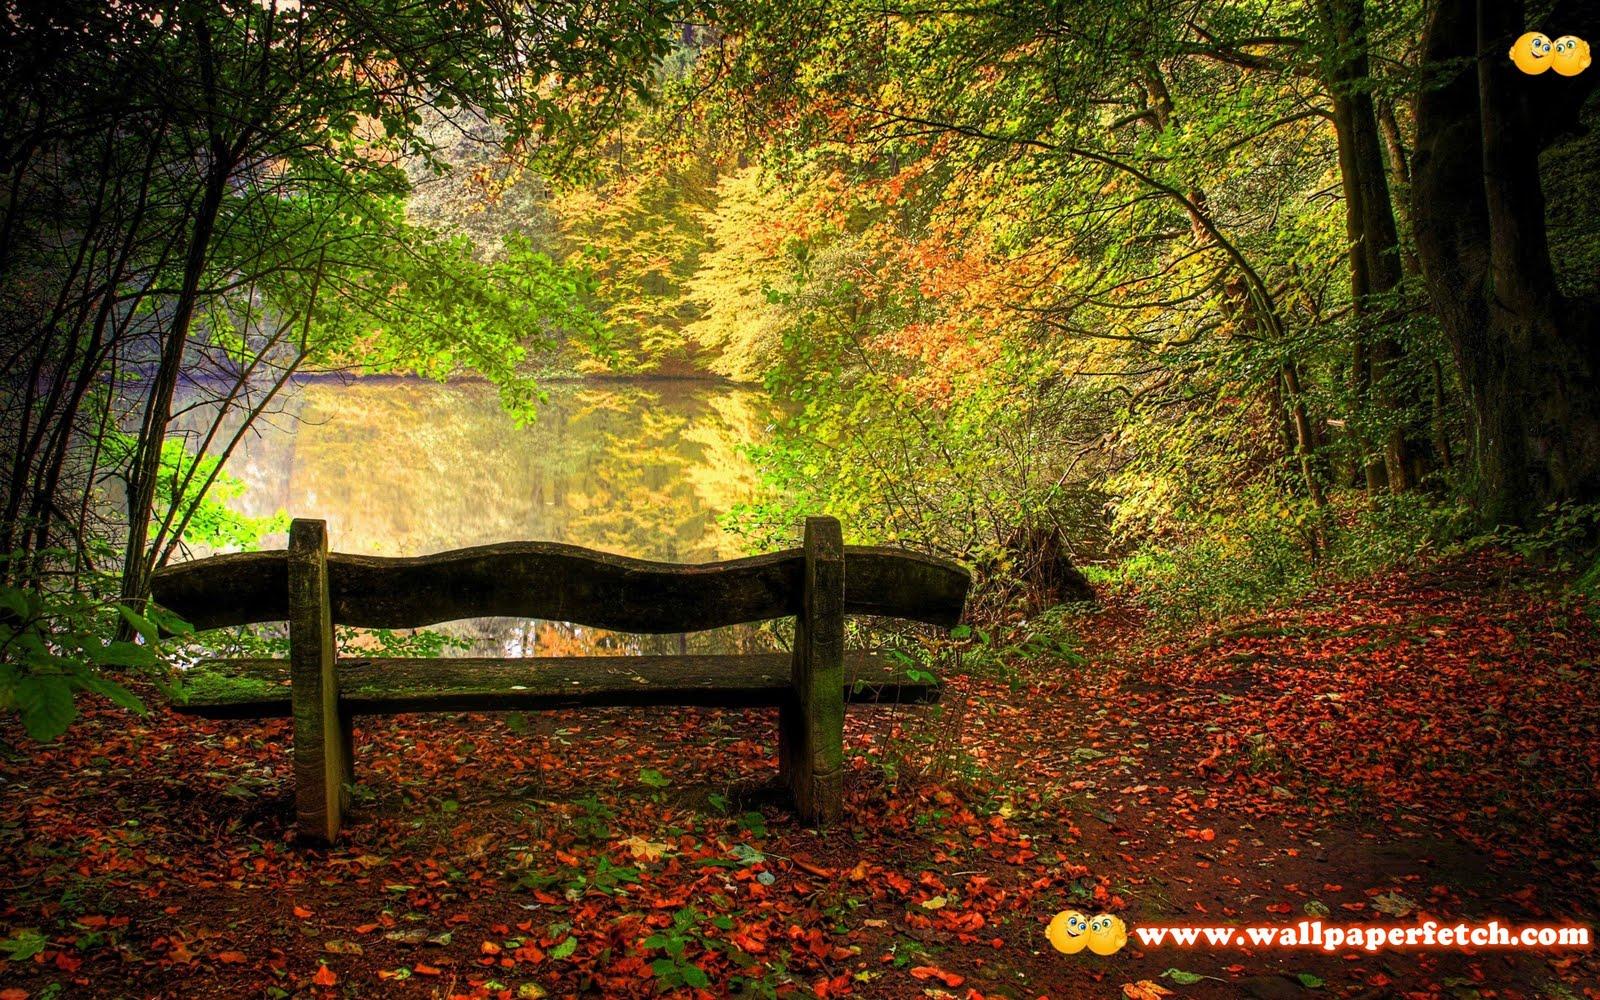 http://1.bp.blogspot.com/-iy-2lZxPrP0/Tr21D0s-N0I/AAAAAAAAKa0/XqBhqo8aFZo/s1600/SuperPack_Beautiful_Nature_HD_Wallpapers_Part__80.65.jpg